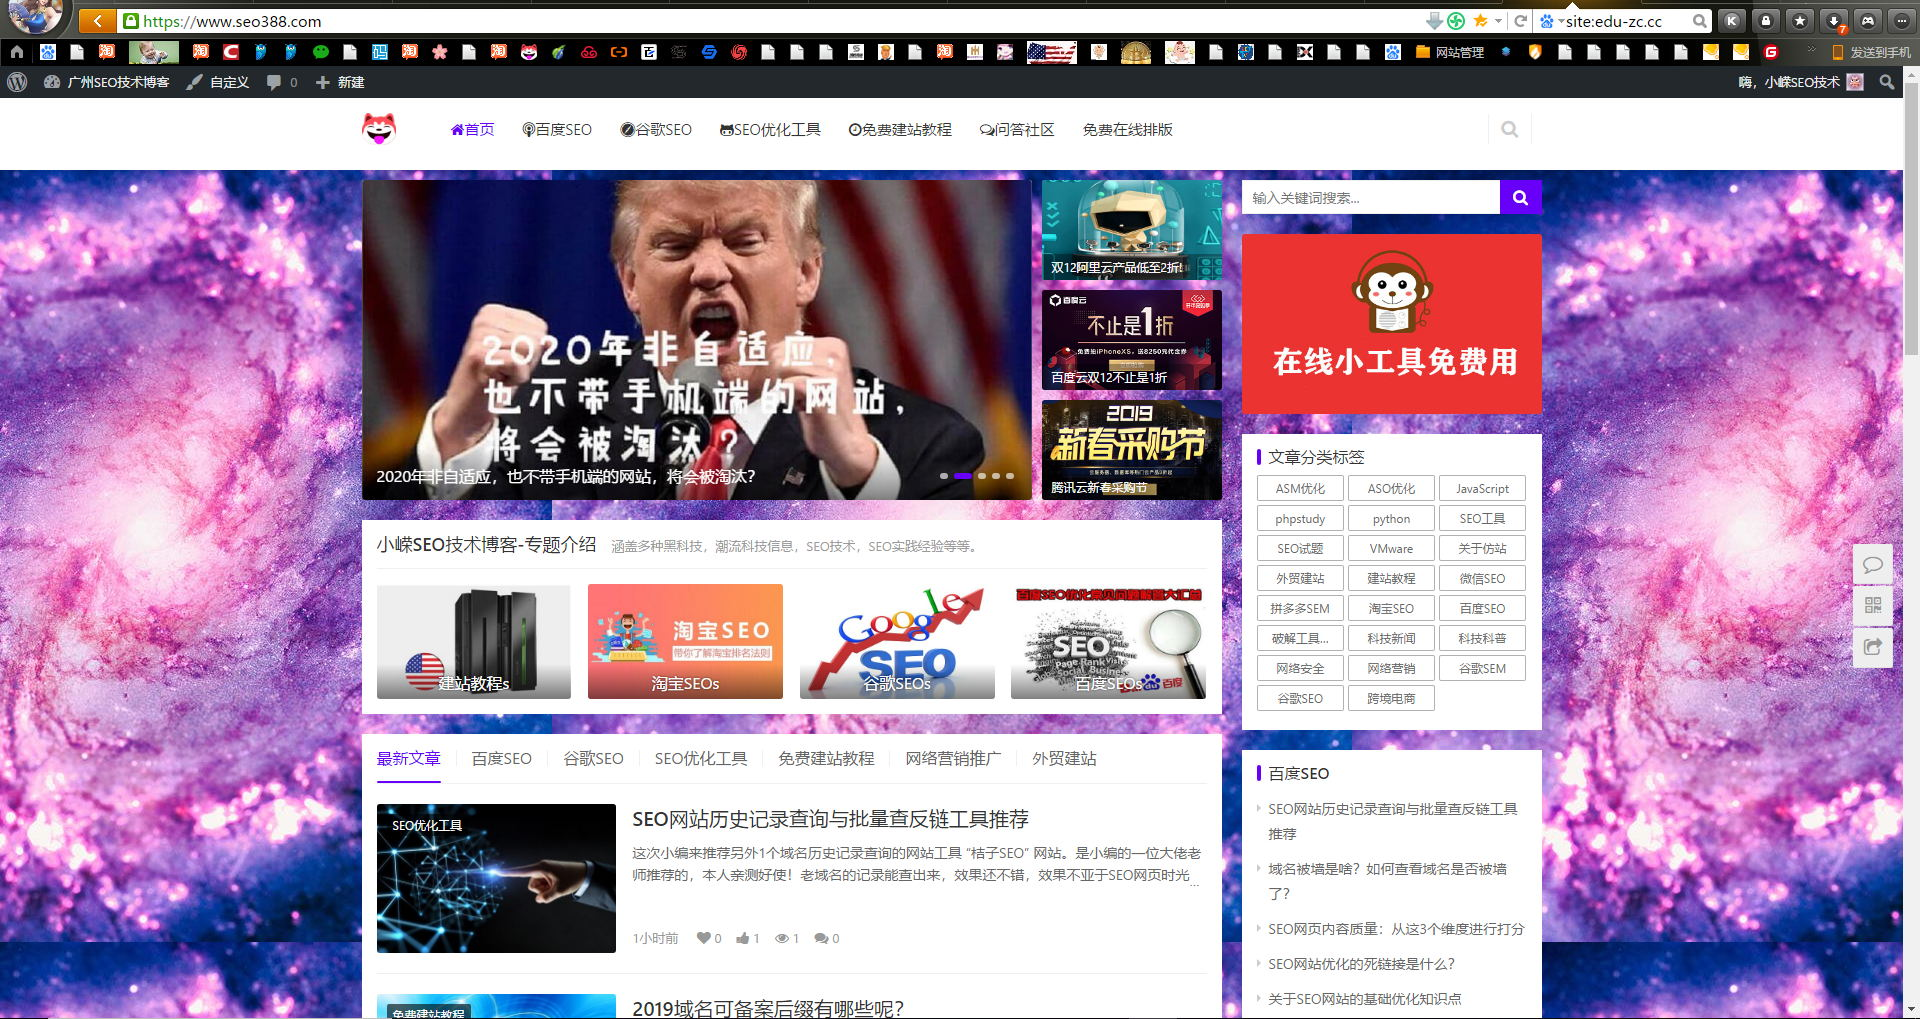 seo博客网站出售